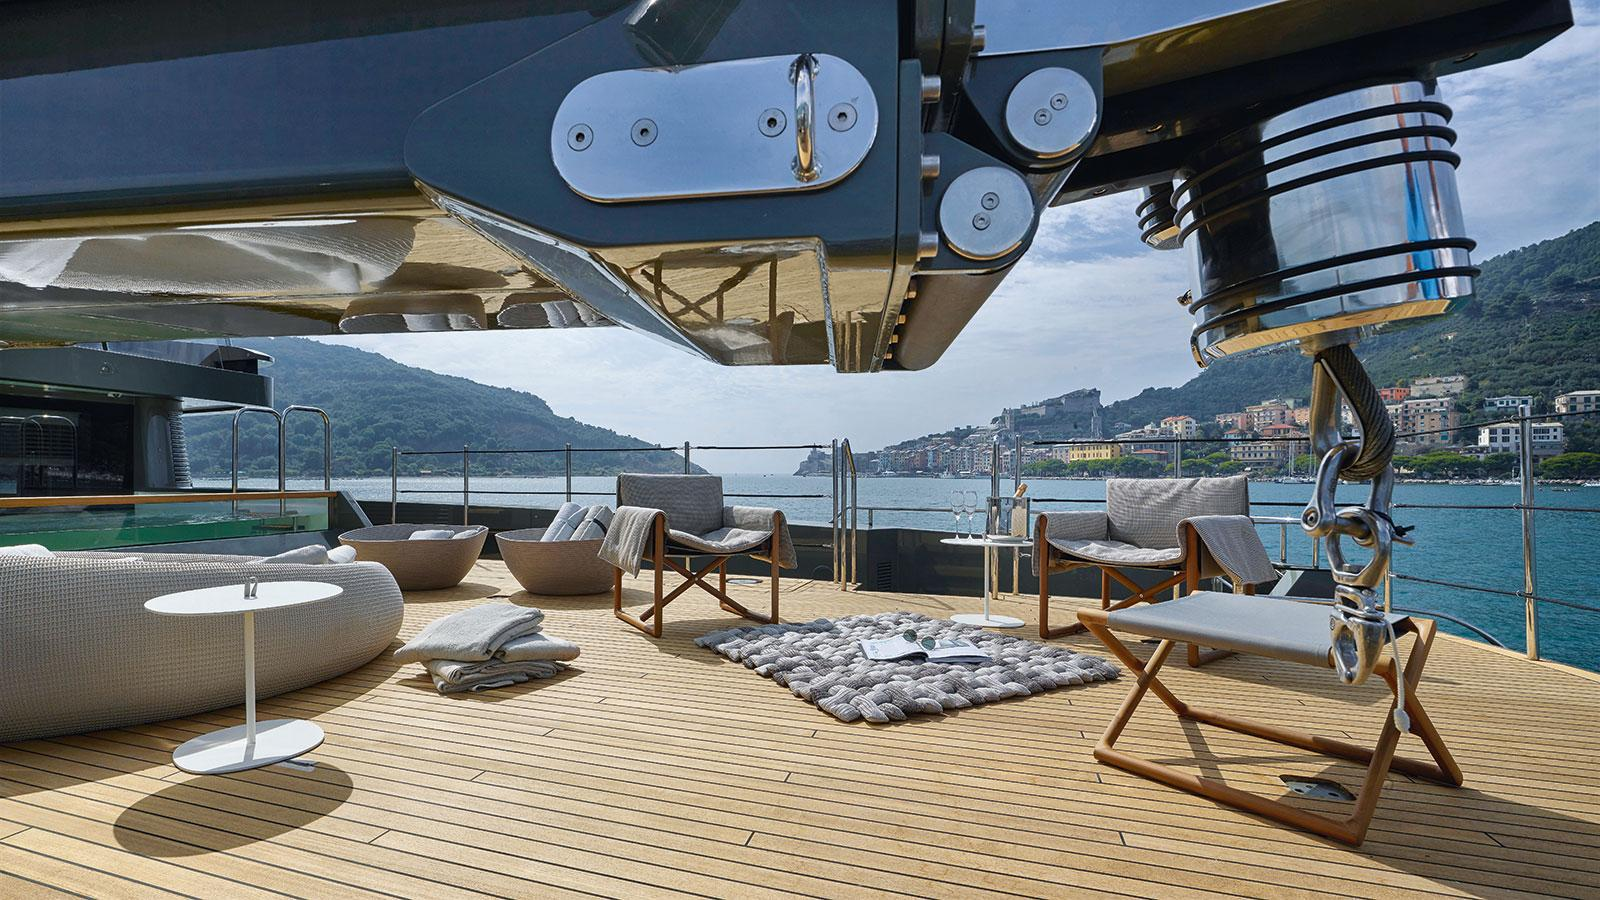 moka-expedition-motor-yacht-sanlorenzo-460-exp-2015-42m-aft-deck-crane